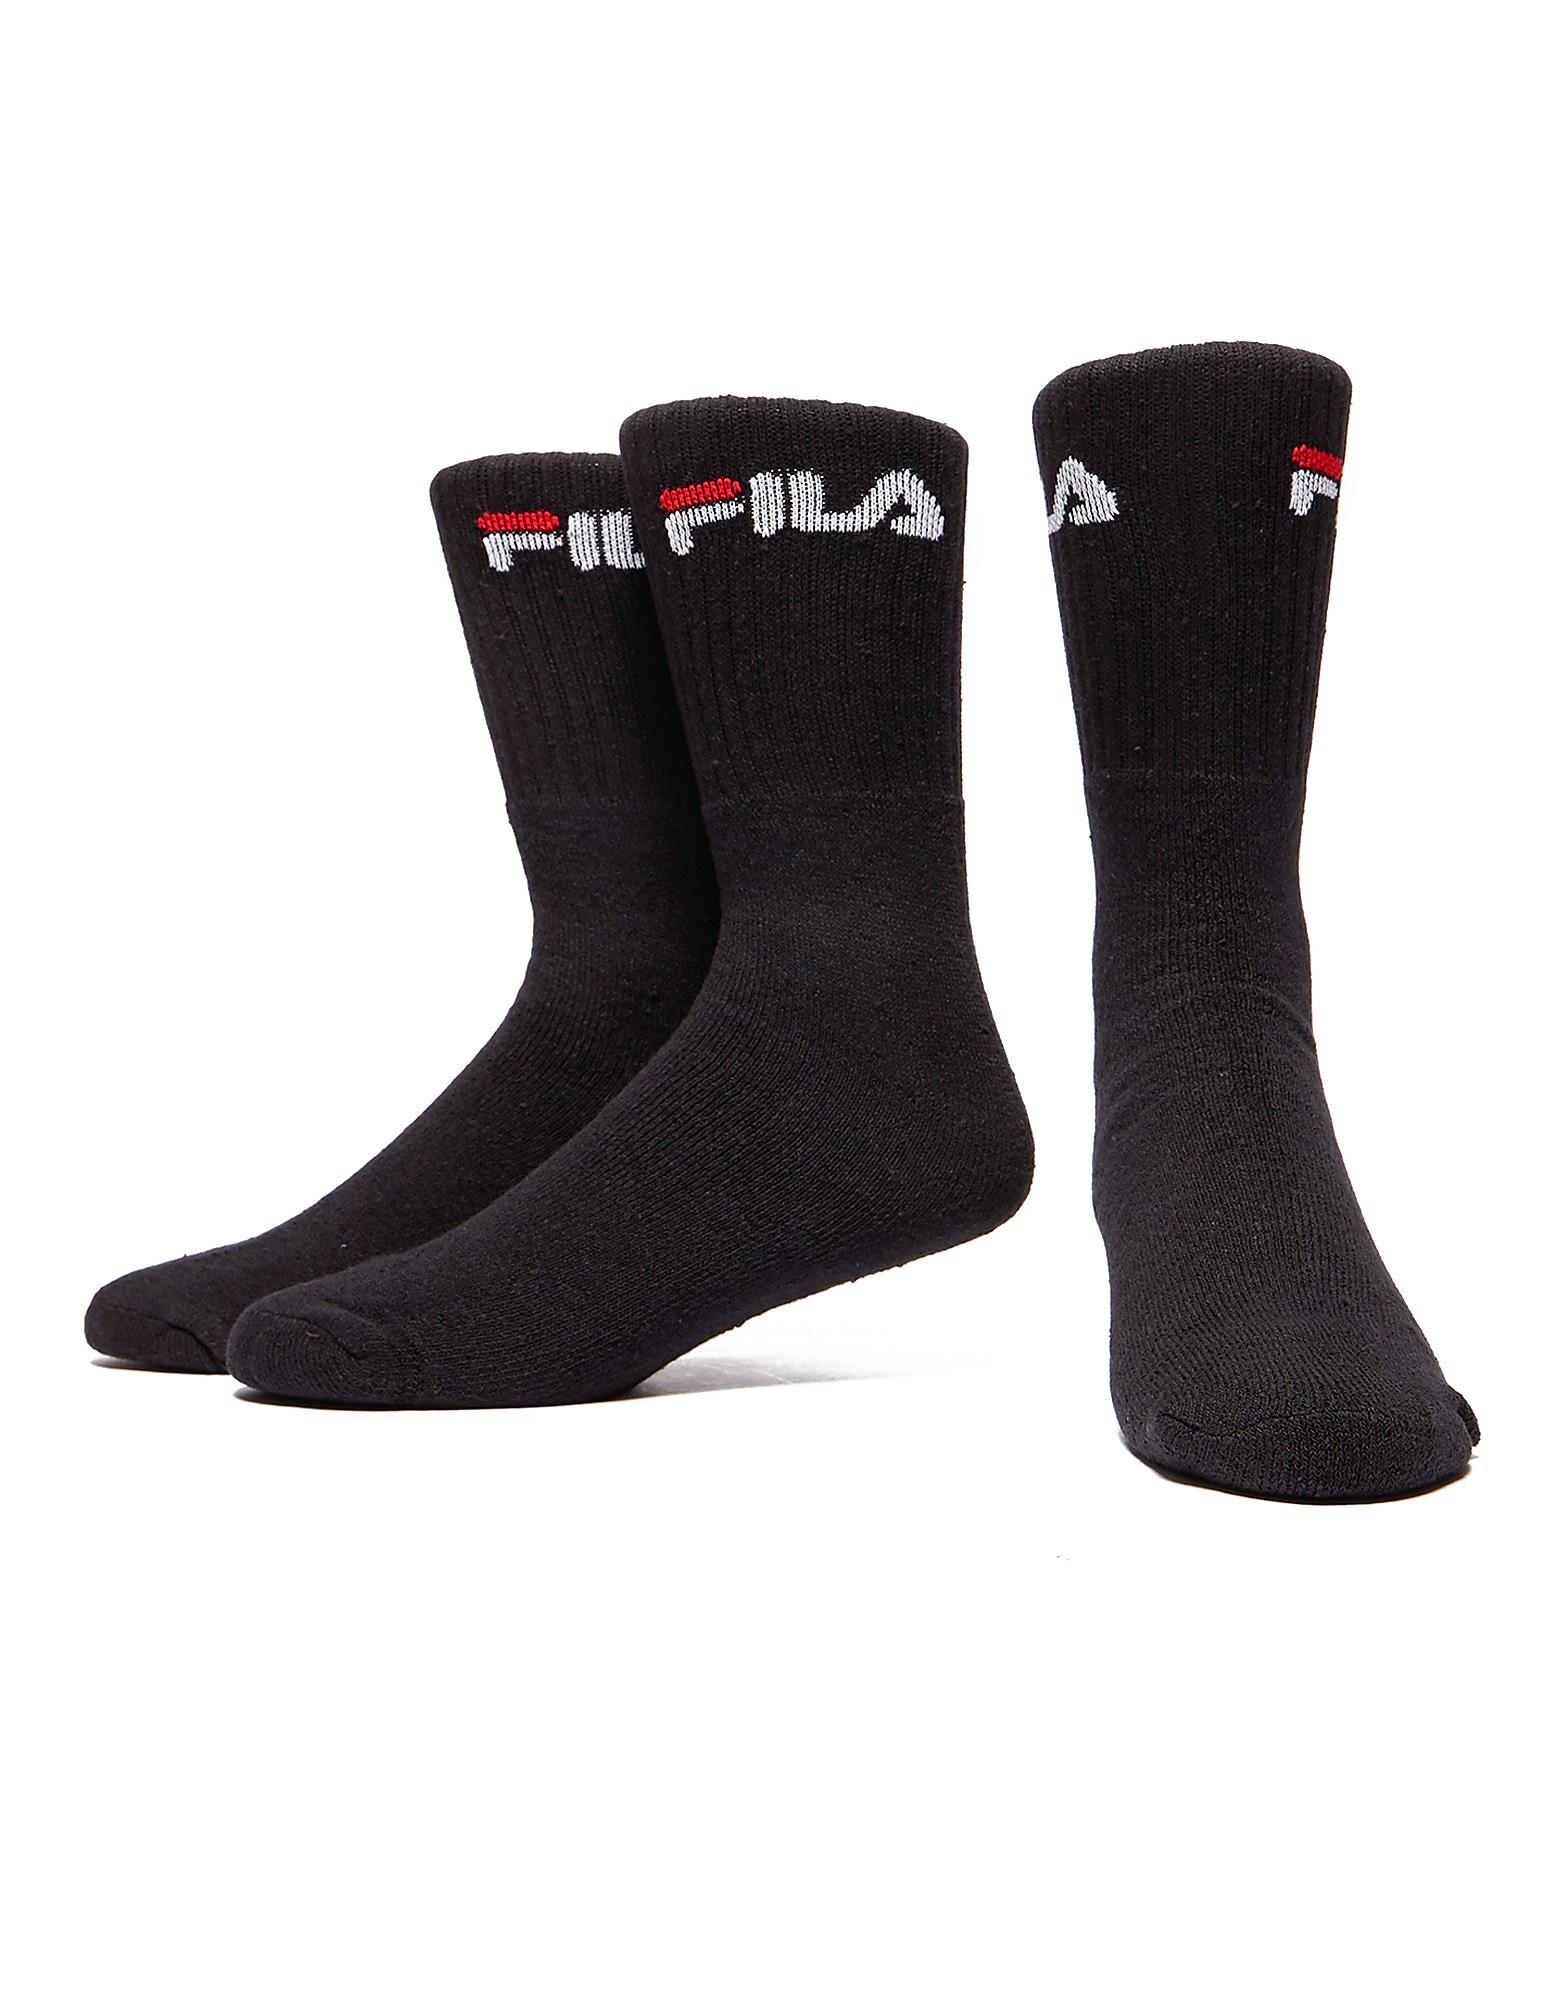 Mens Black Fila Crew Training Socks (3 Pairs)